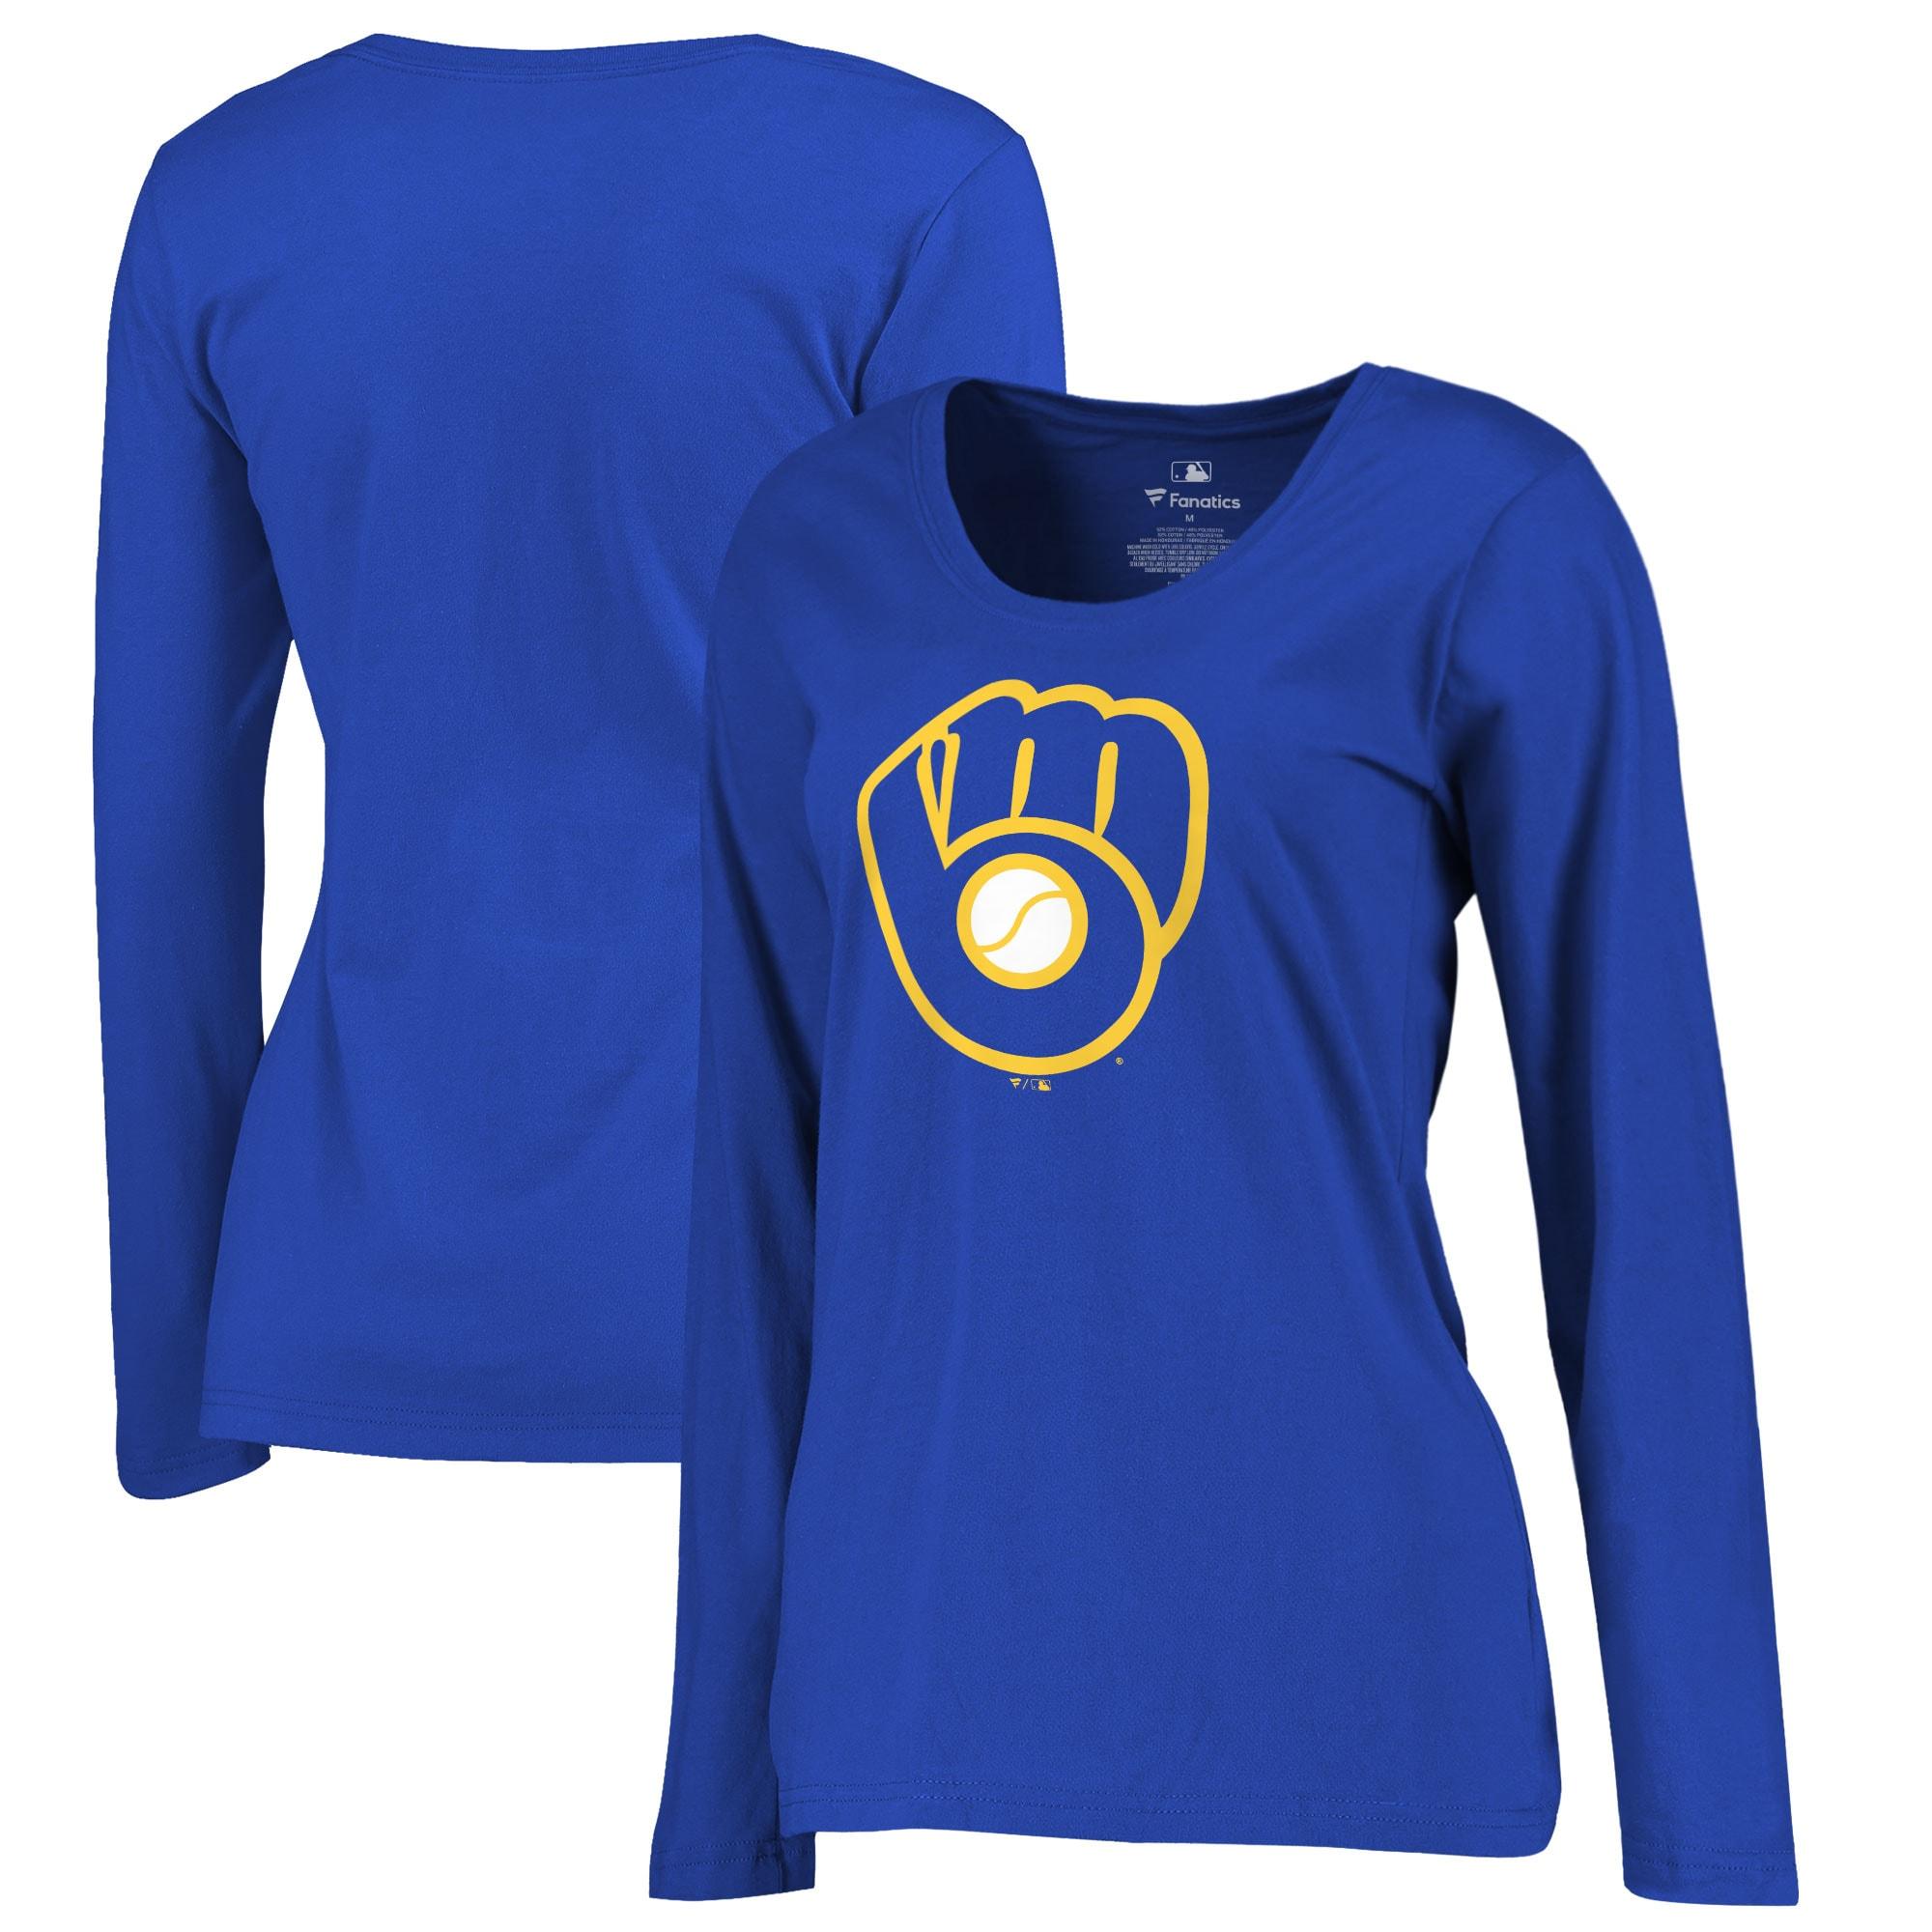 Milwaukee Brewers Women's Plus Sizes Primary Team Logo Long Sleeve T-Shirt - Royal